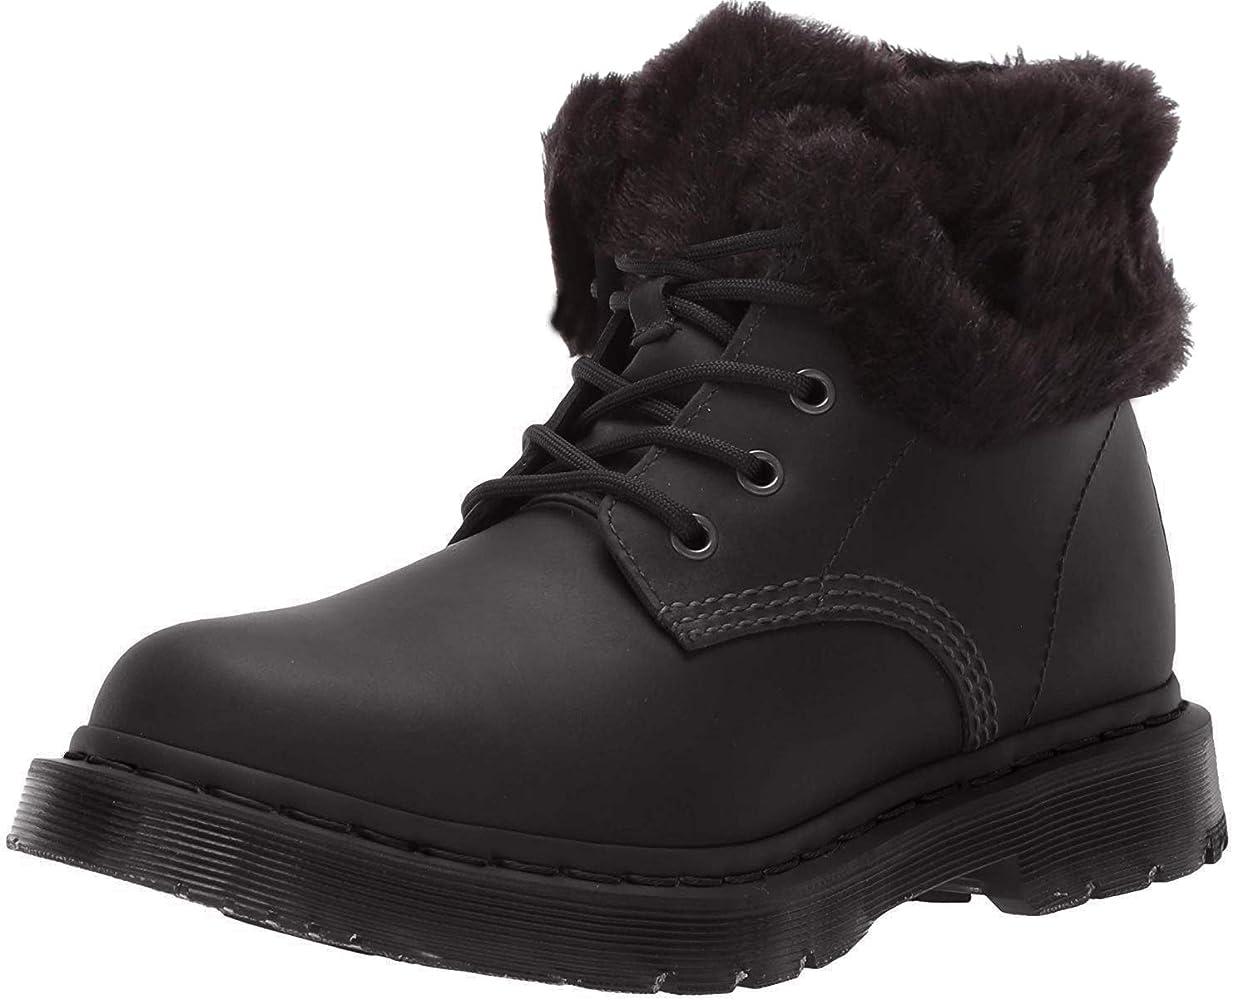 Amazon Com Dr Martens Women S 1460 Kolbert Snow Boot Black Snowplow Wp Waxy Waterproof Suede 5 Snow Boots